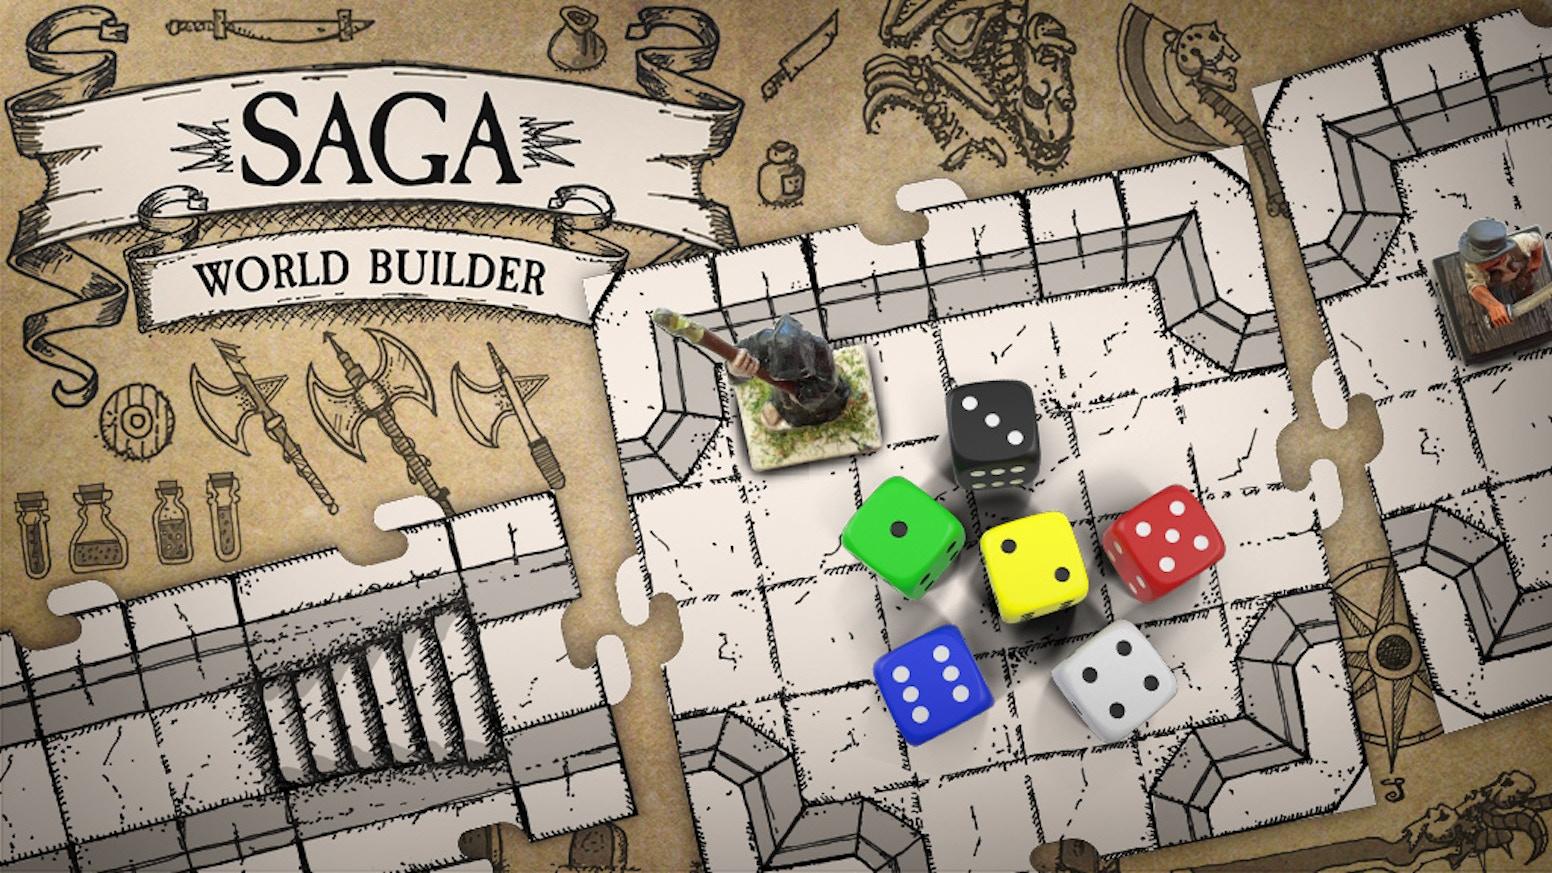 Saga World Builder Modular Tiles For Tabletop And D Amp D